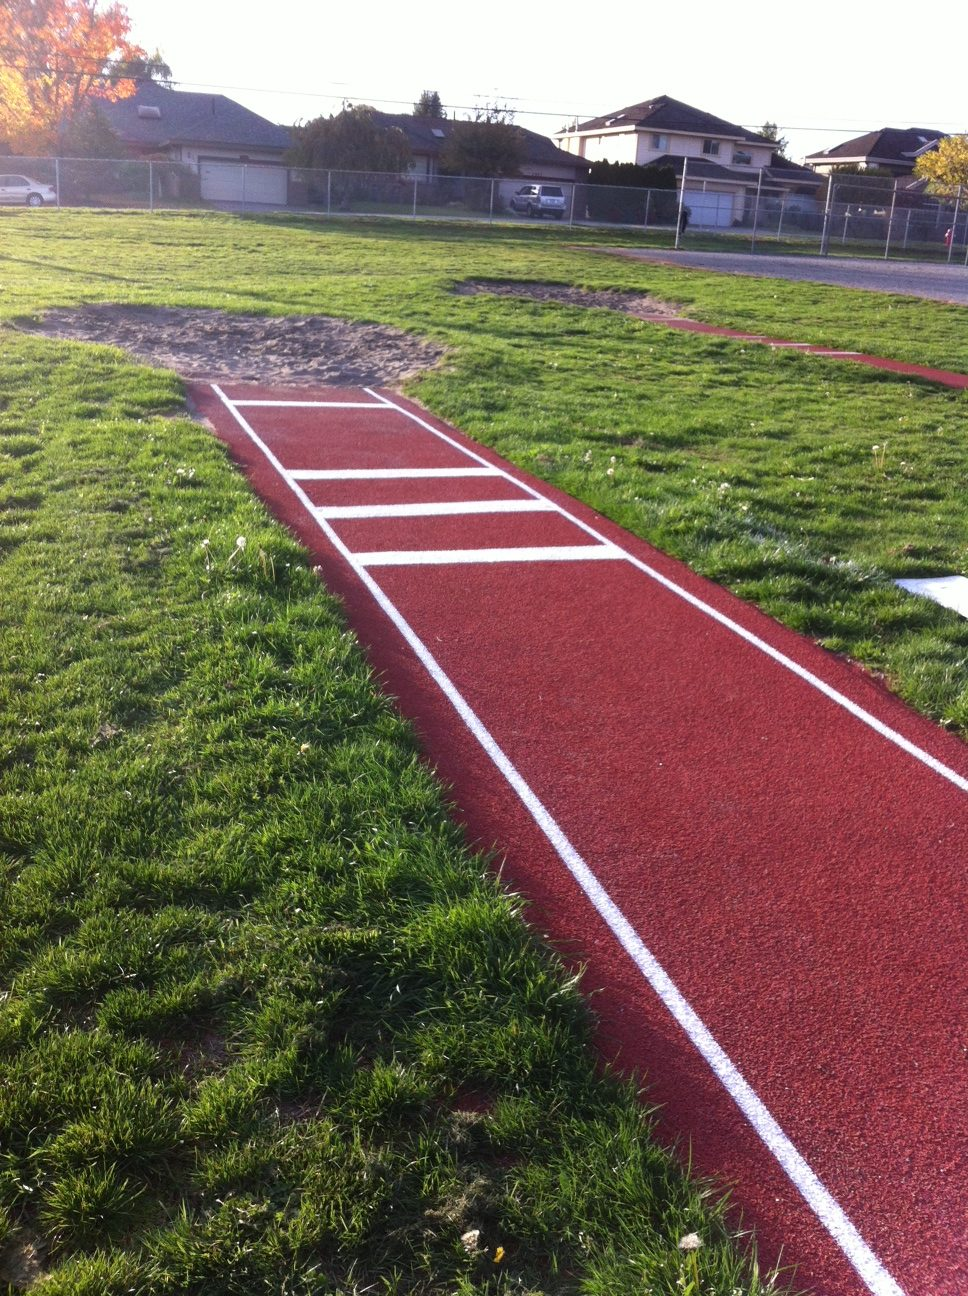 Running Tracks Marathon Surfaces